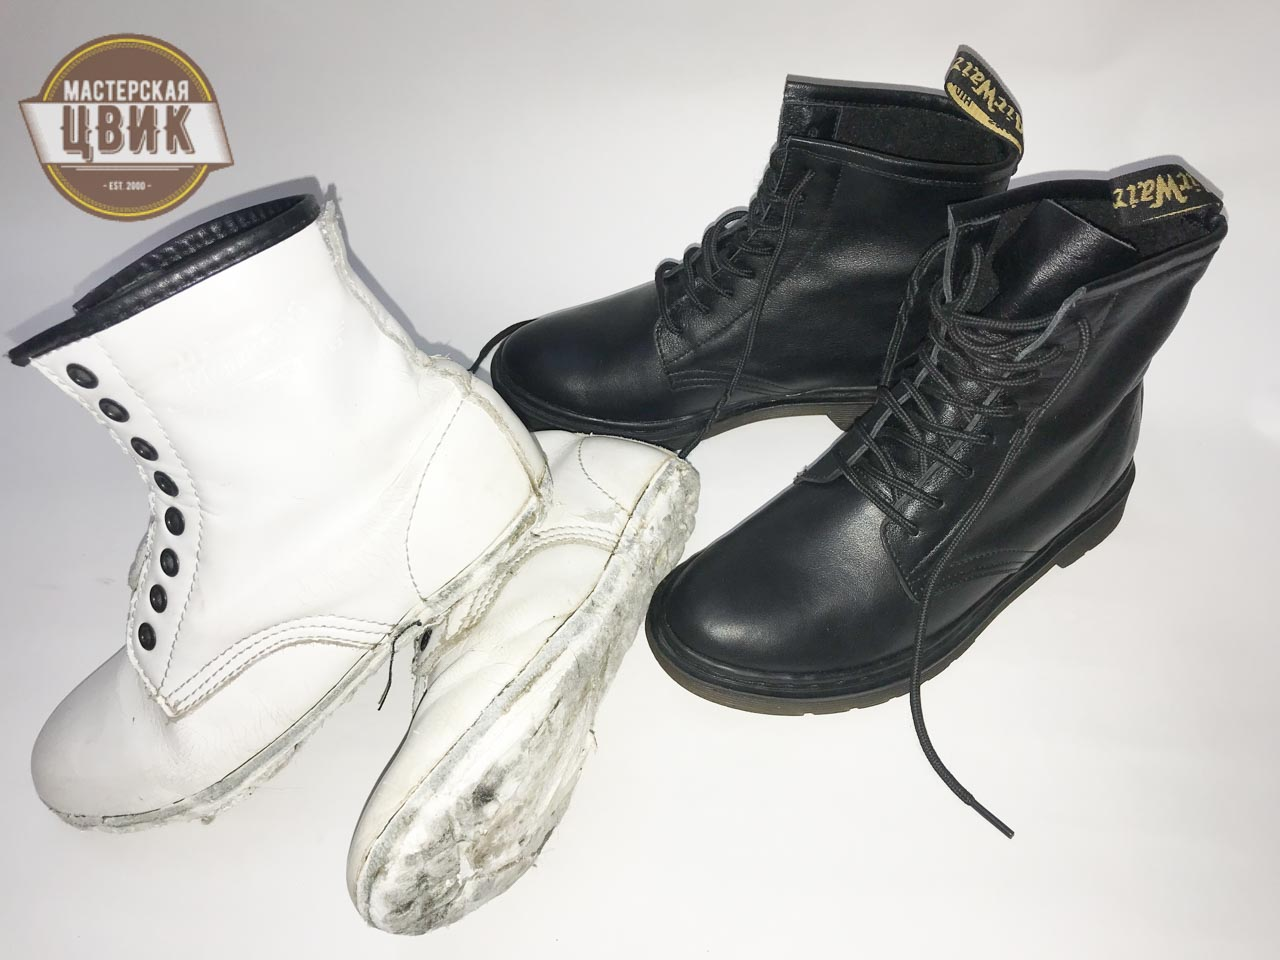 individualnyj-poshiv-obuvi-minsk-70 Индивидуальный пошив обуви